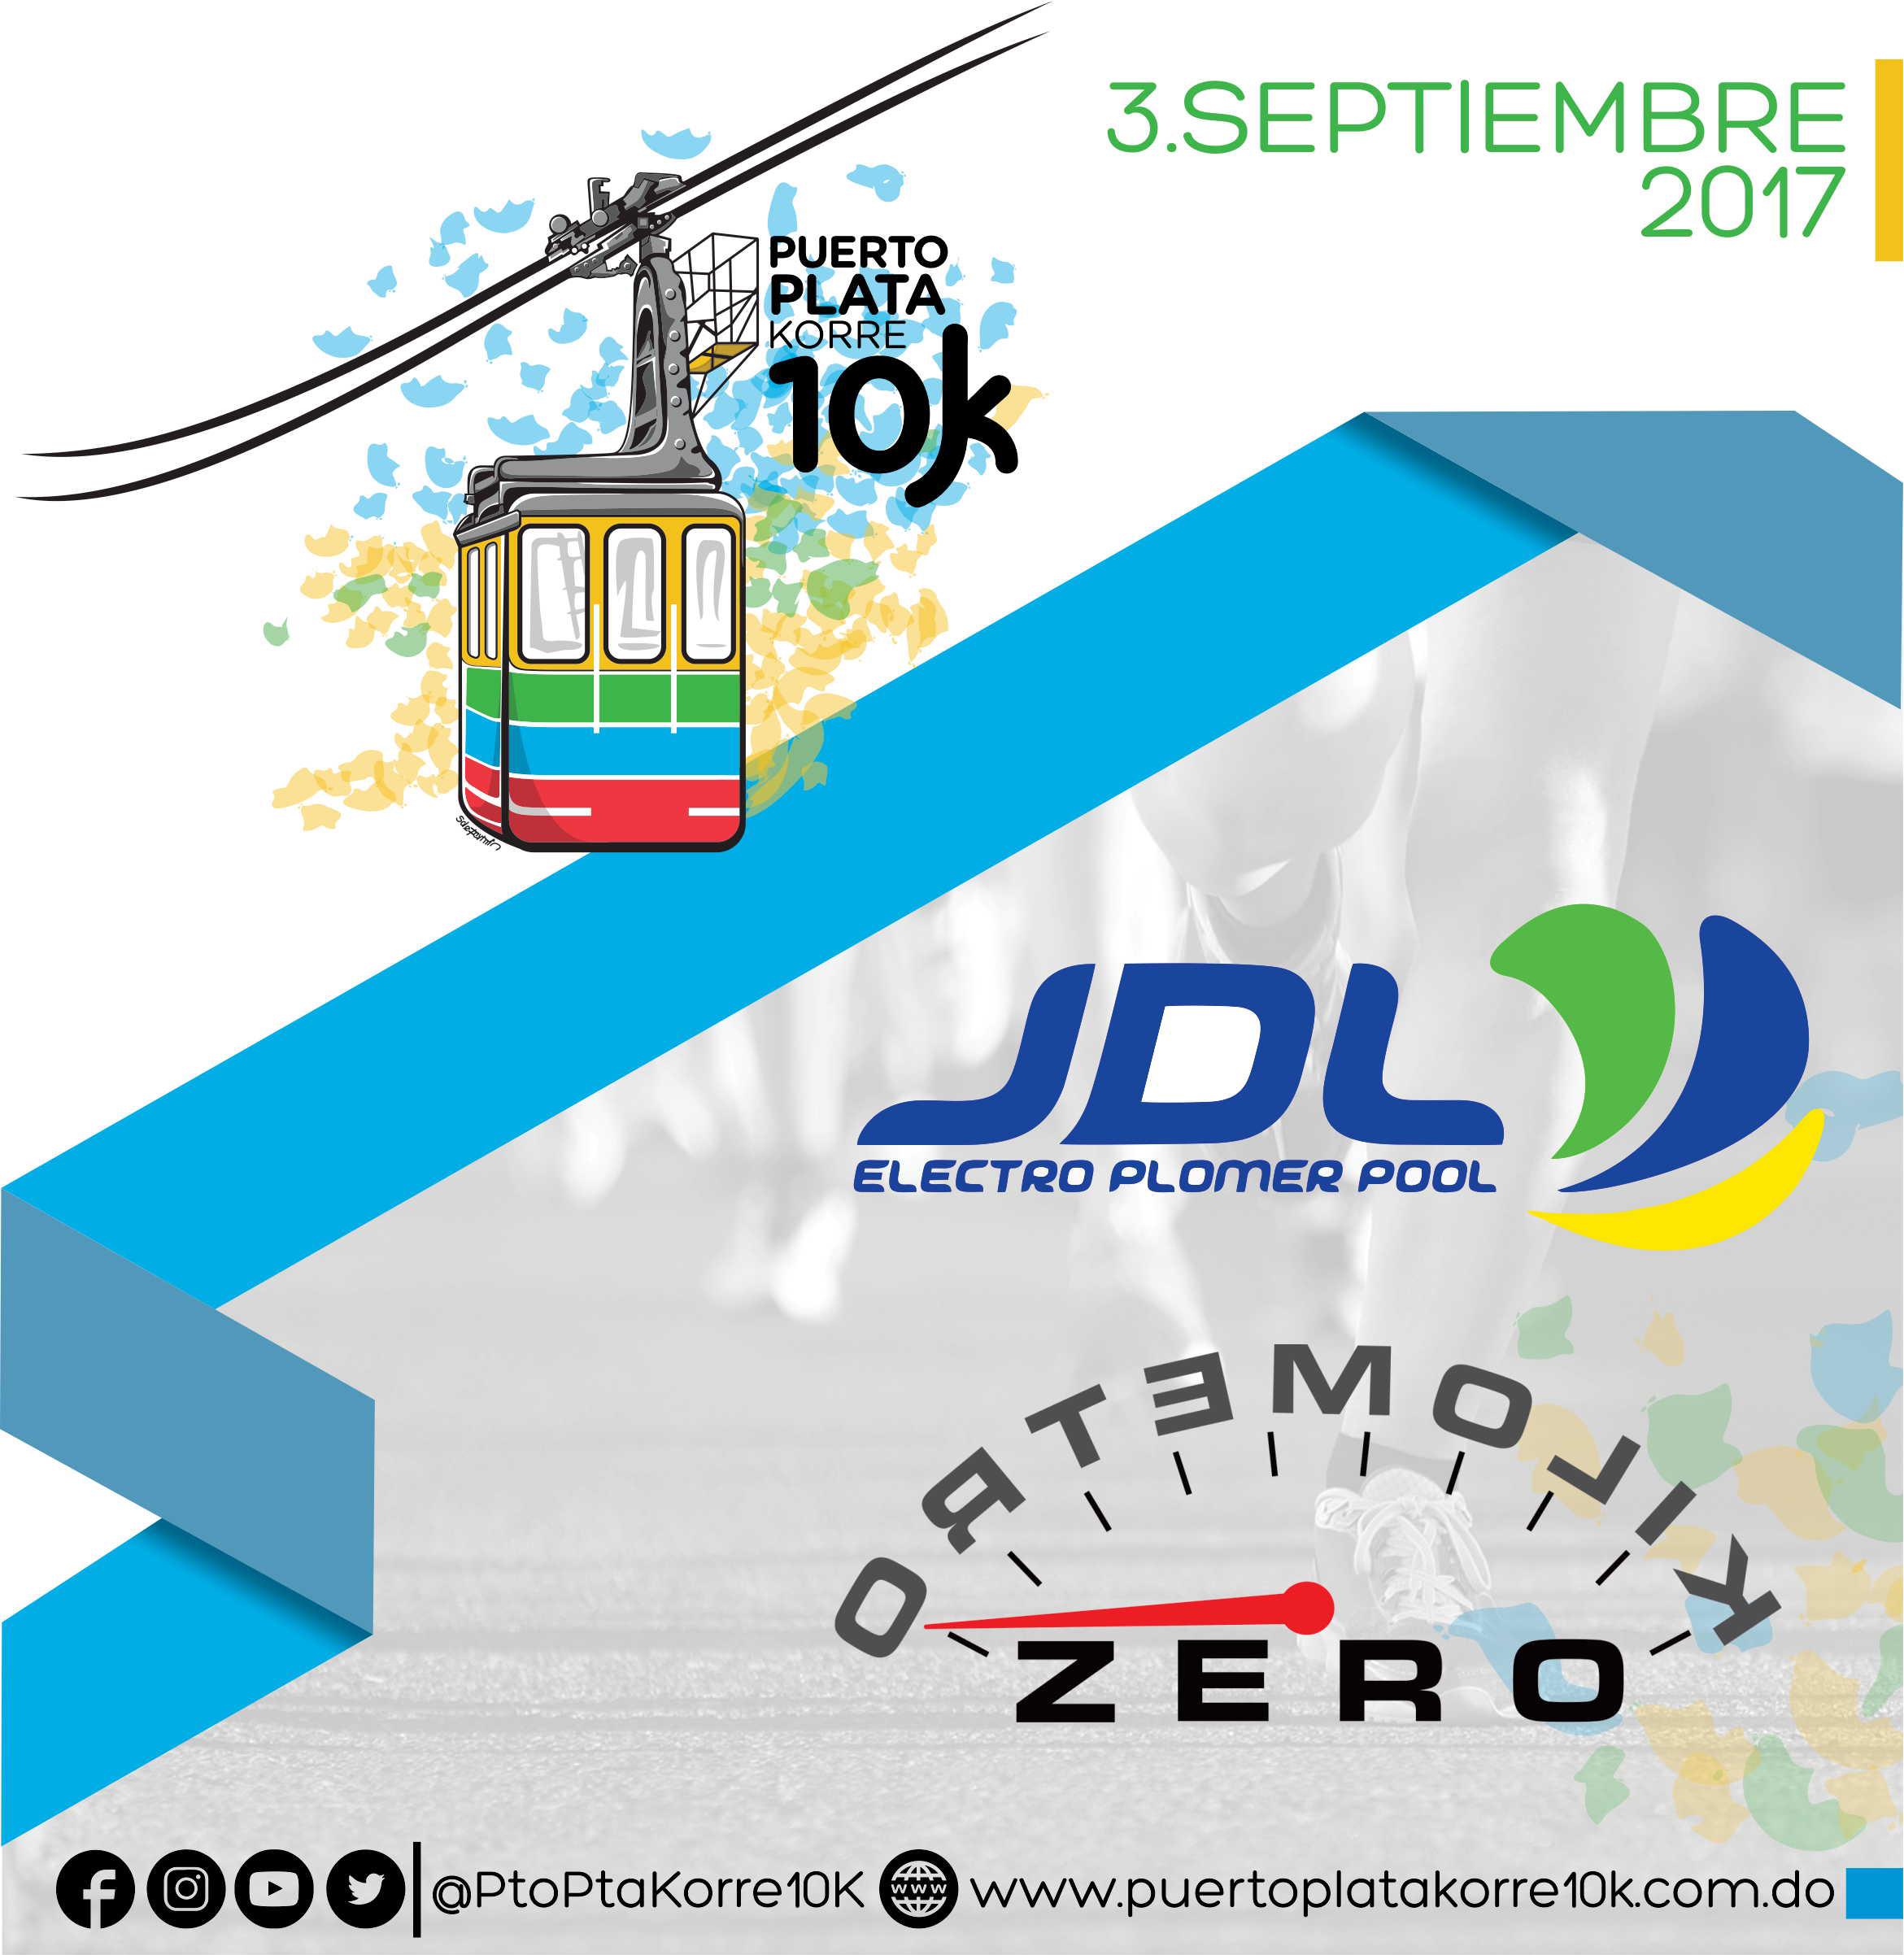 9- jdl & kilometro zero